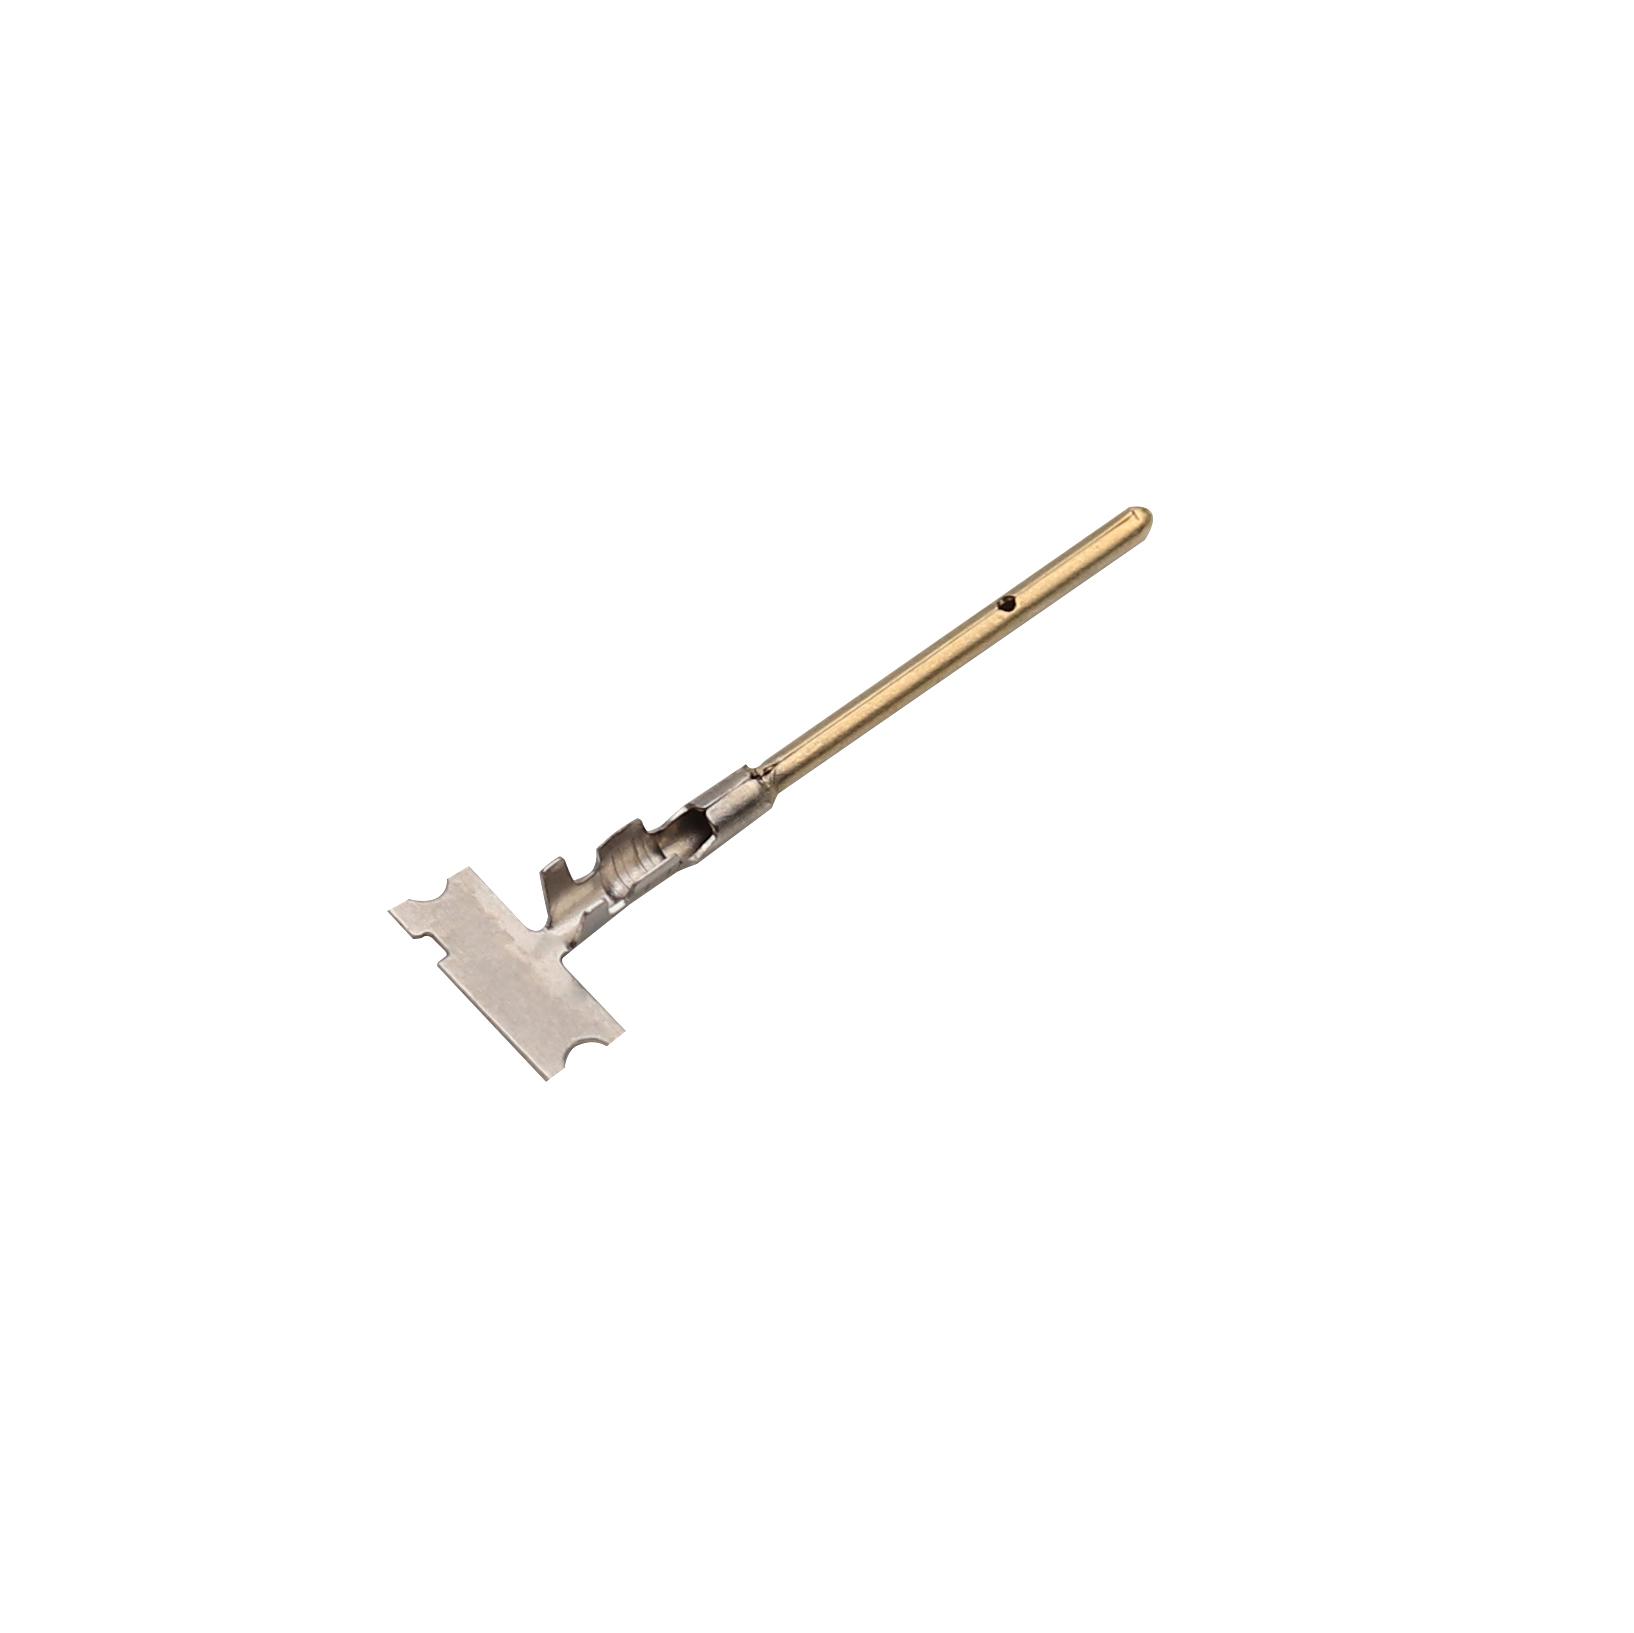 1.0x21.5鍍金公端 醫療端子接插件端子精密模具優質生產廠家志盈端子